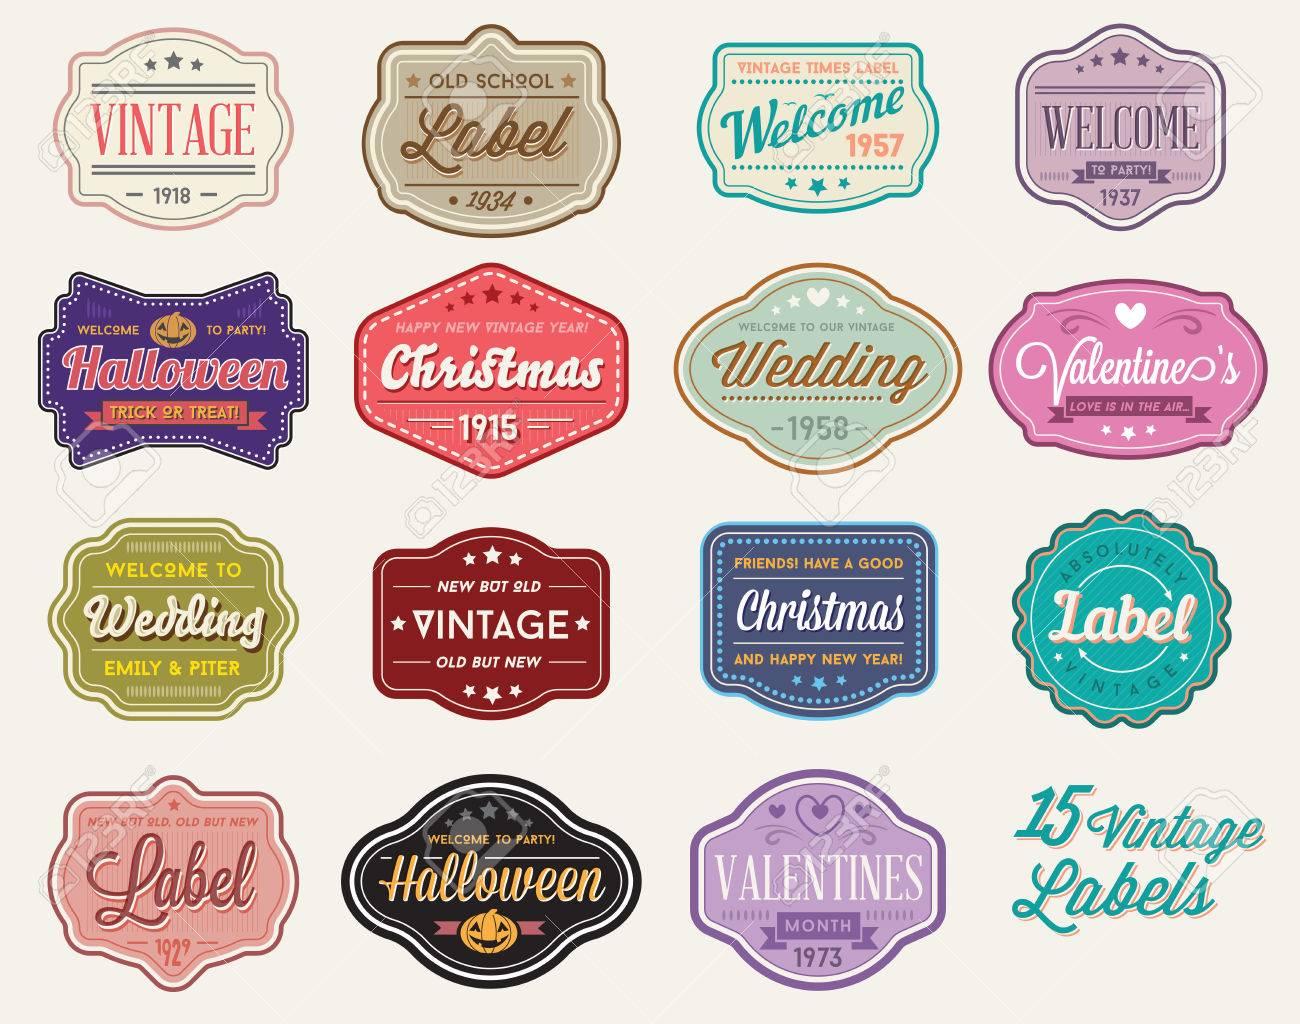 Vector Set of Vintage Retro Styled Premium Design Labels - 53374784